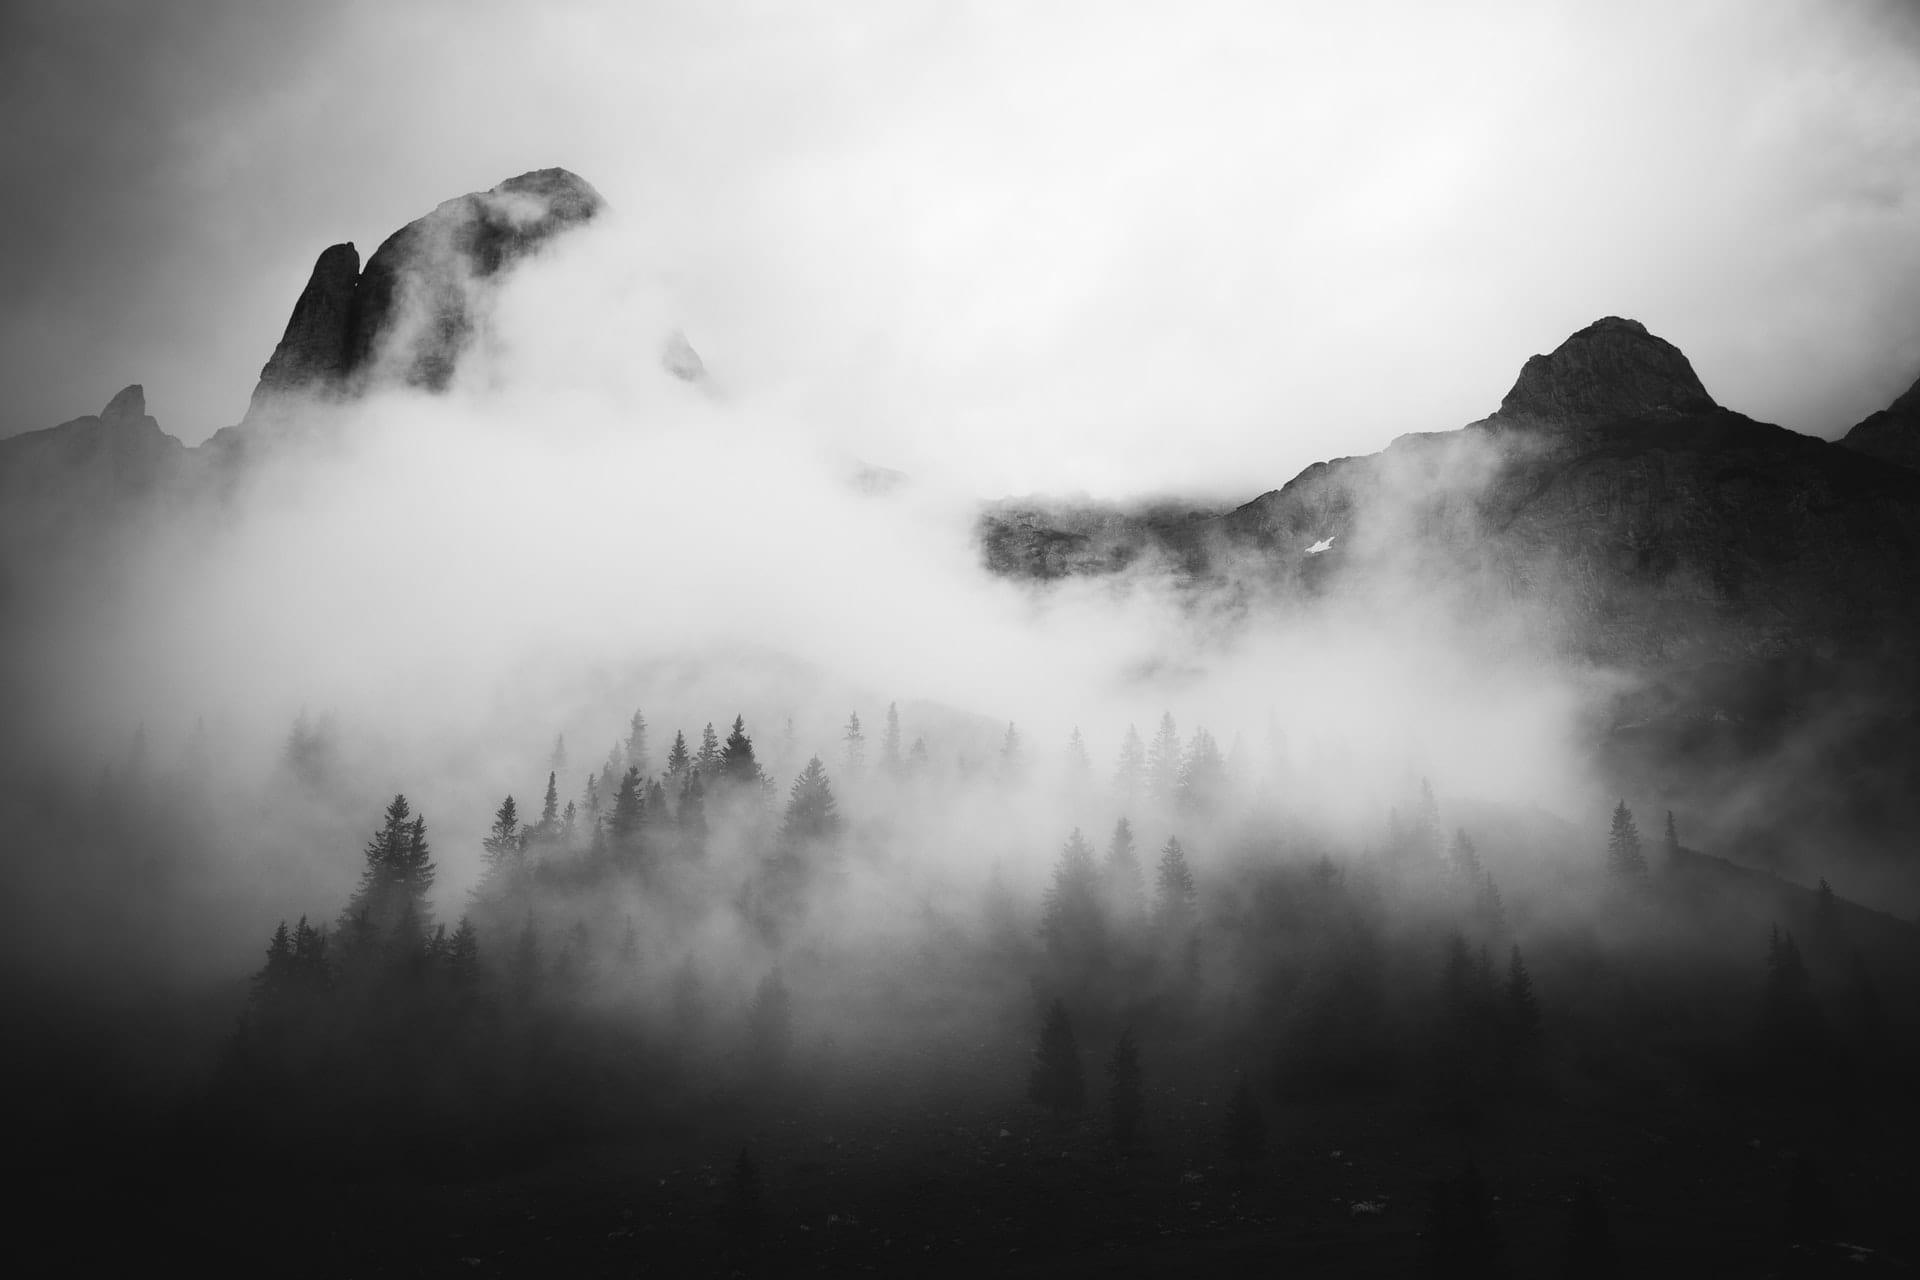 fog-pines